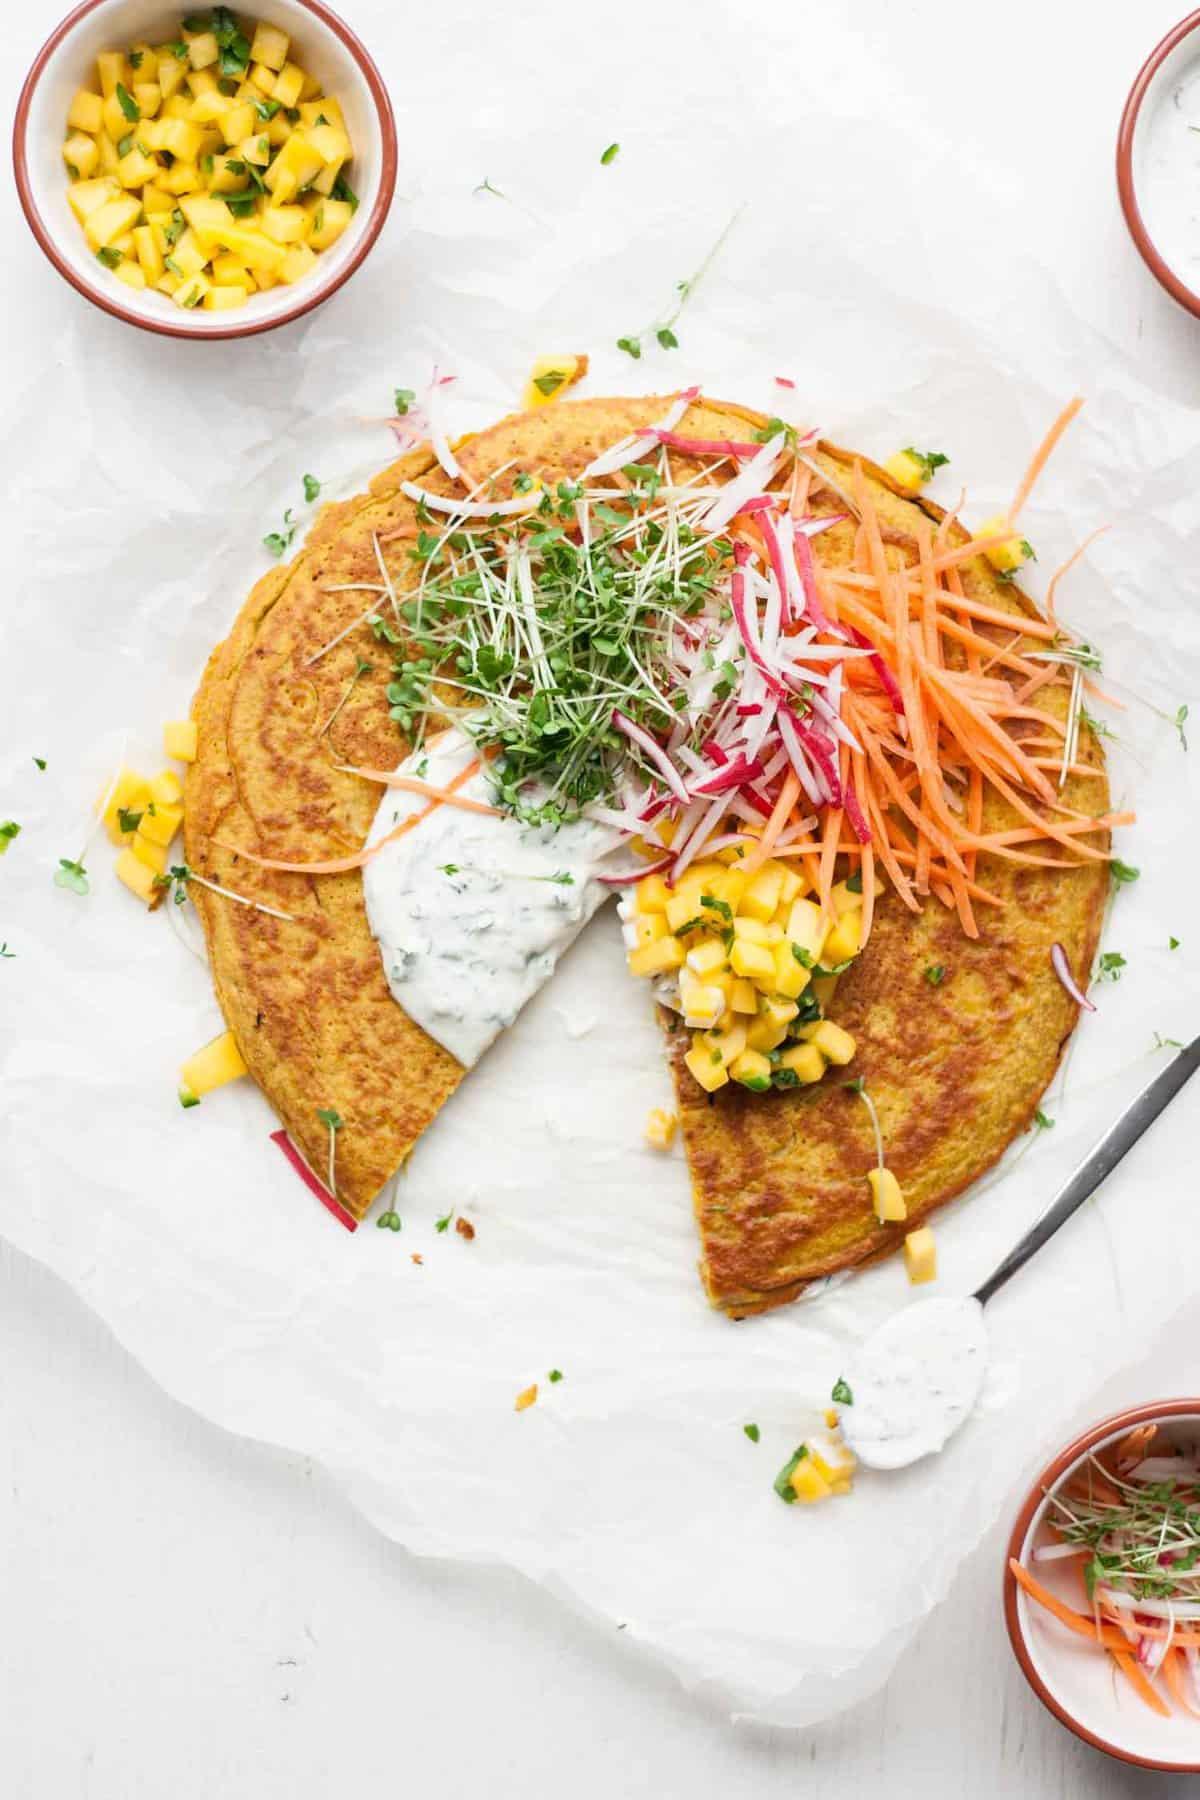 Onion bhaji pancake with mango salsa eat love eat onion bhaji pancake with mango salsa forumfinder Gallery